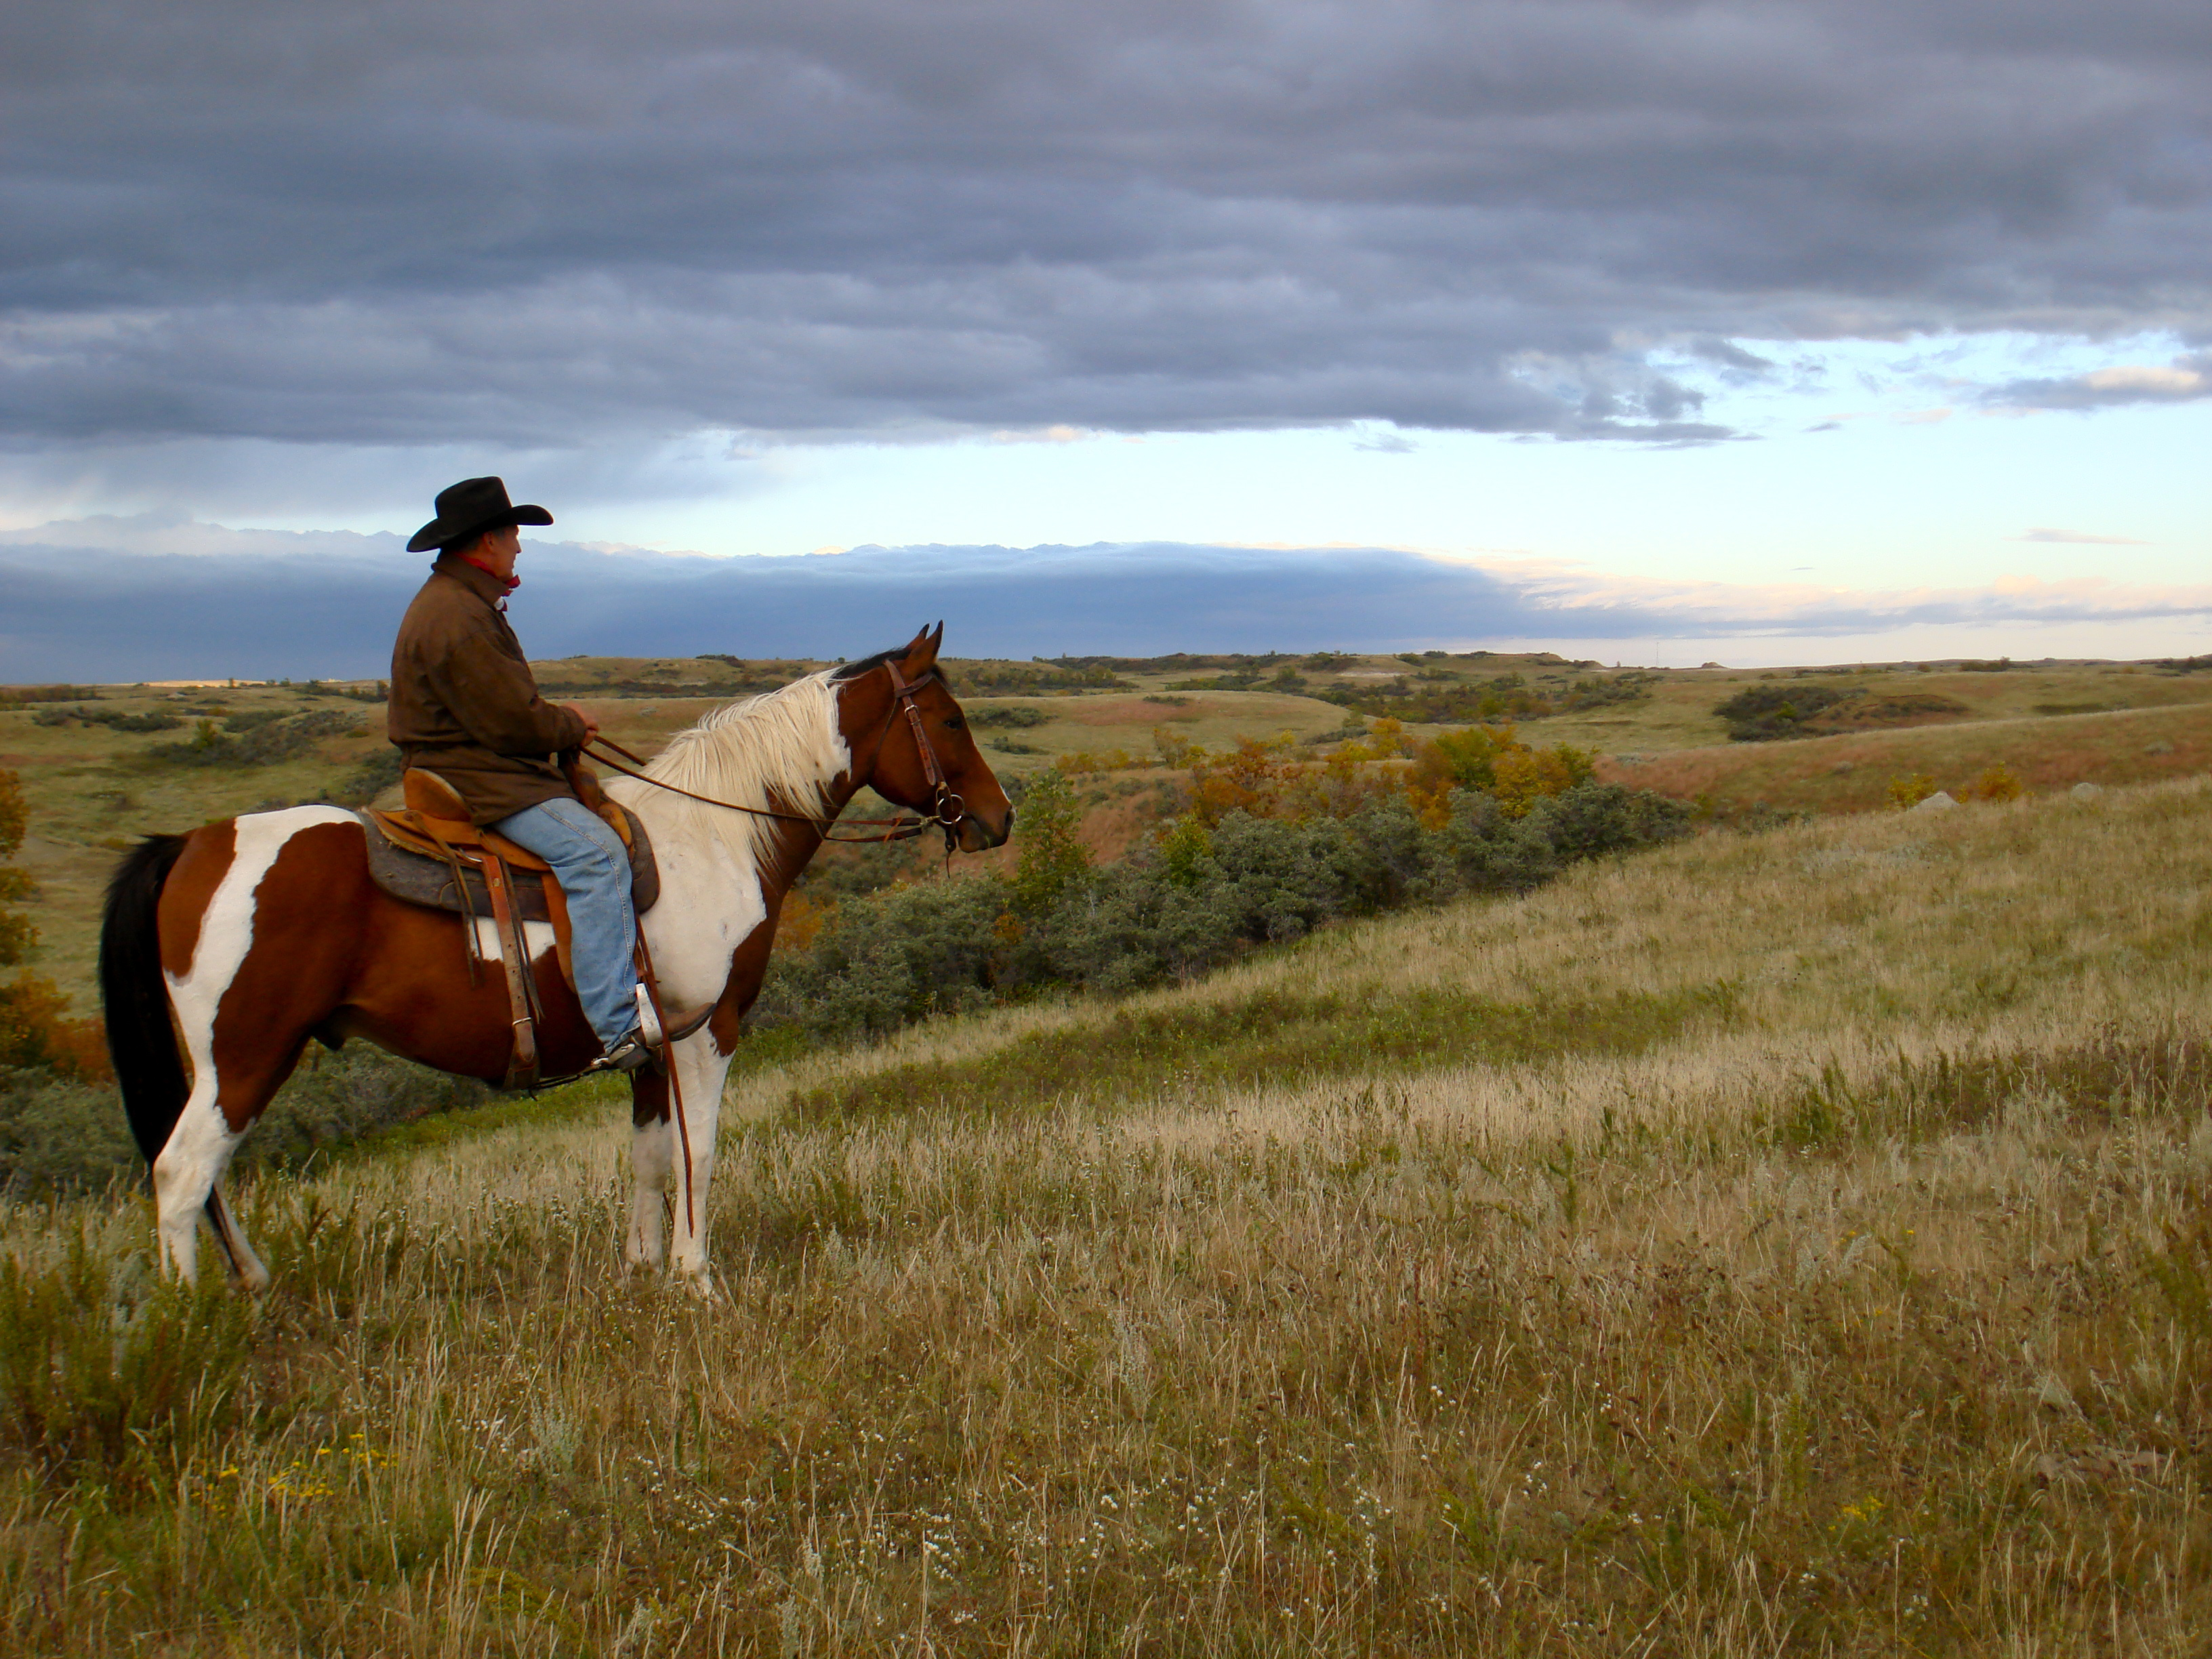 Horse on horizon